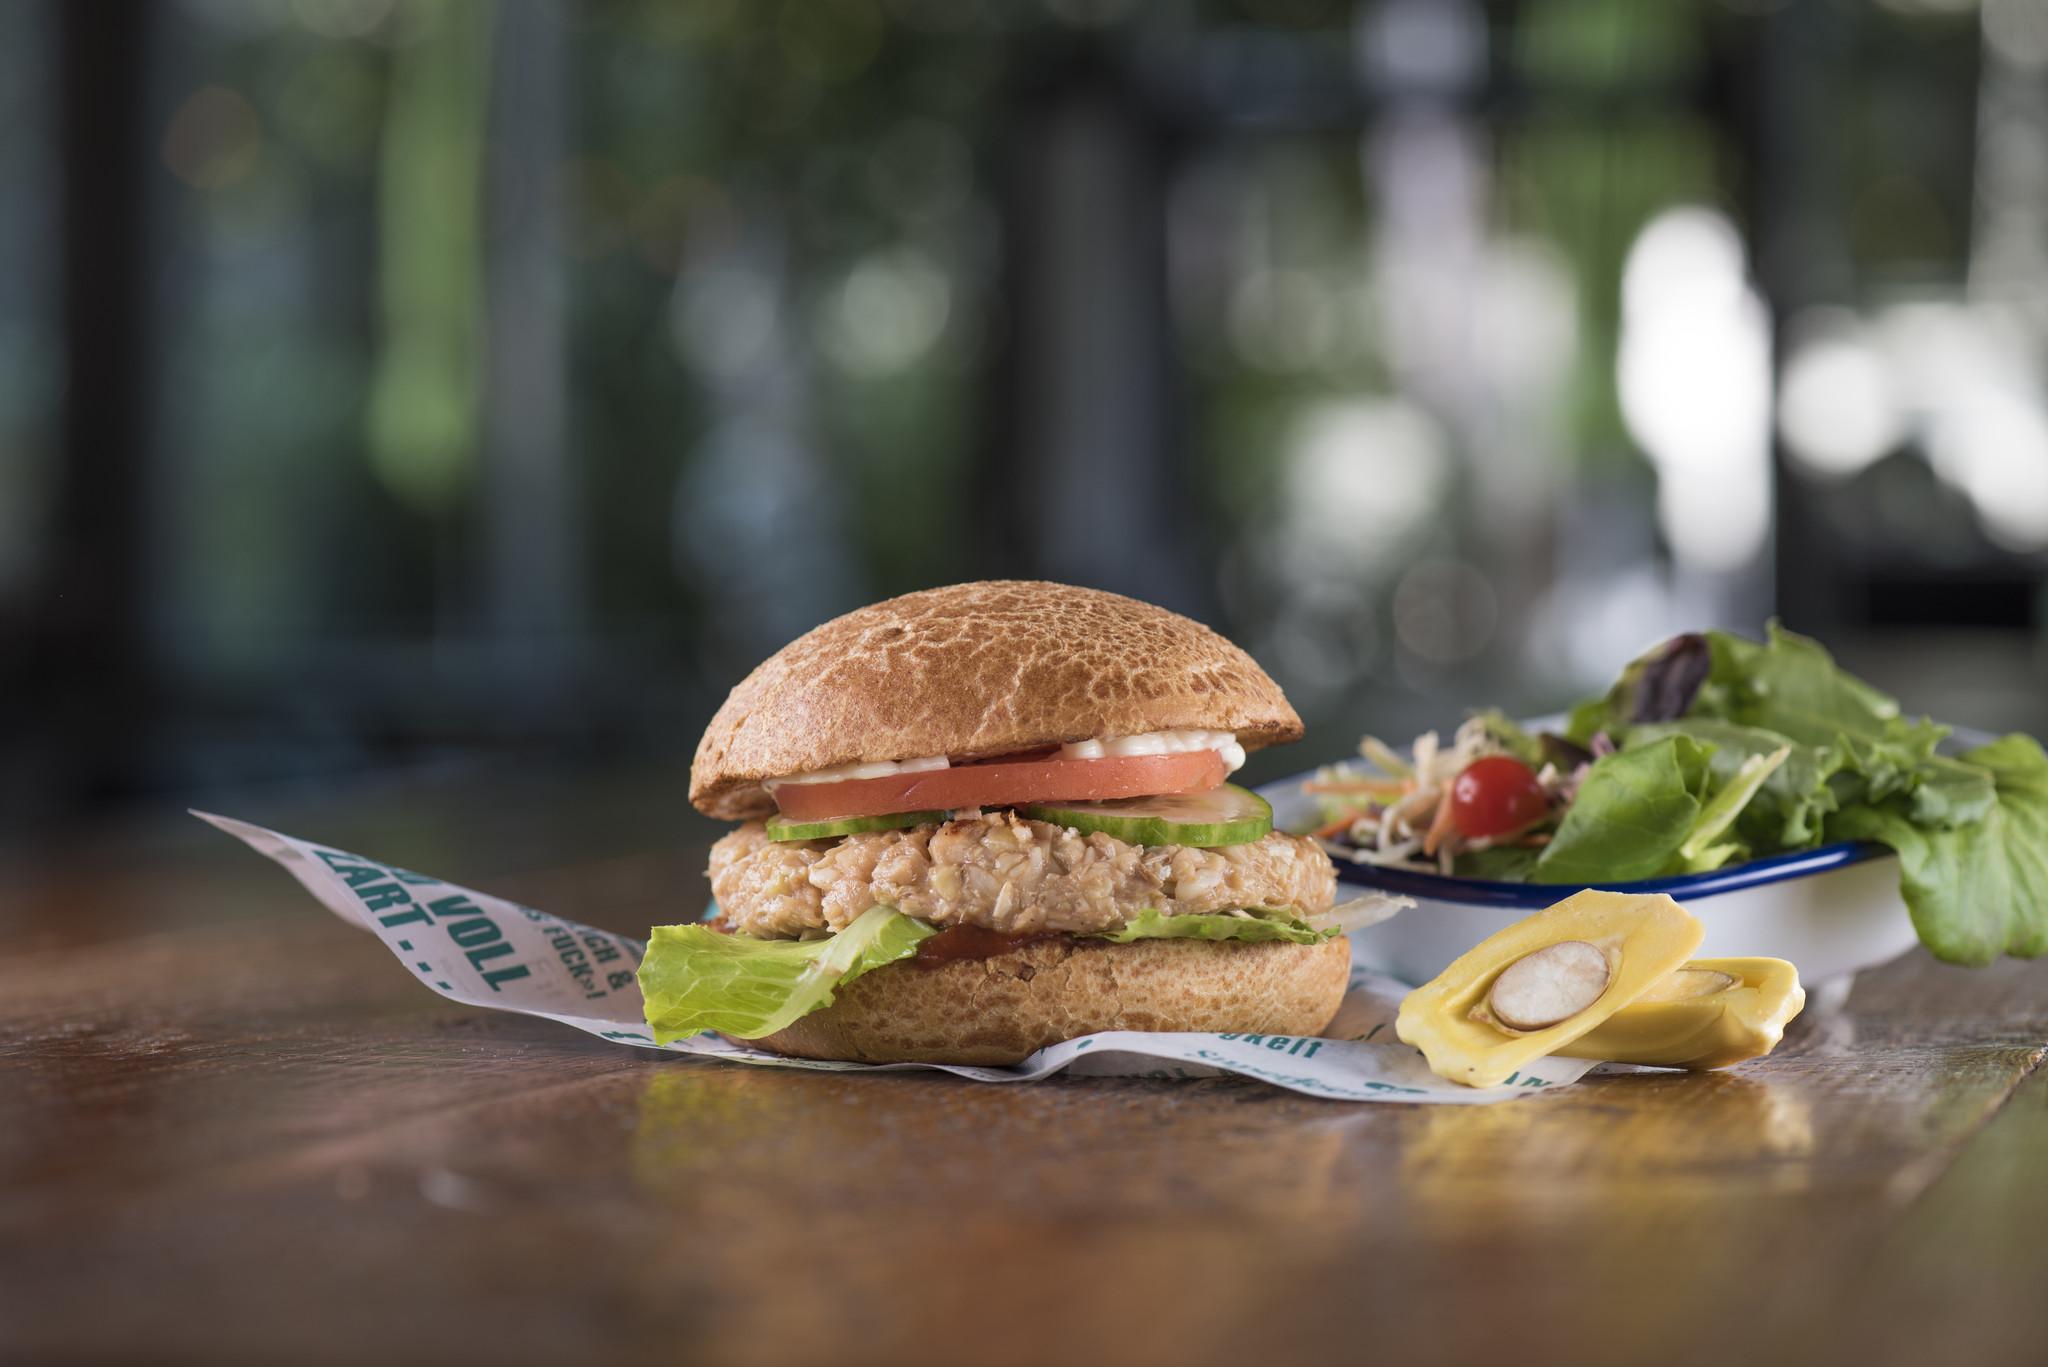 The Butcher Burger Kernenmix